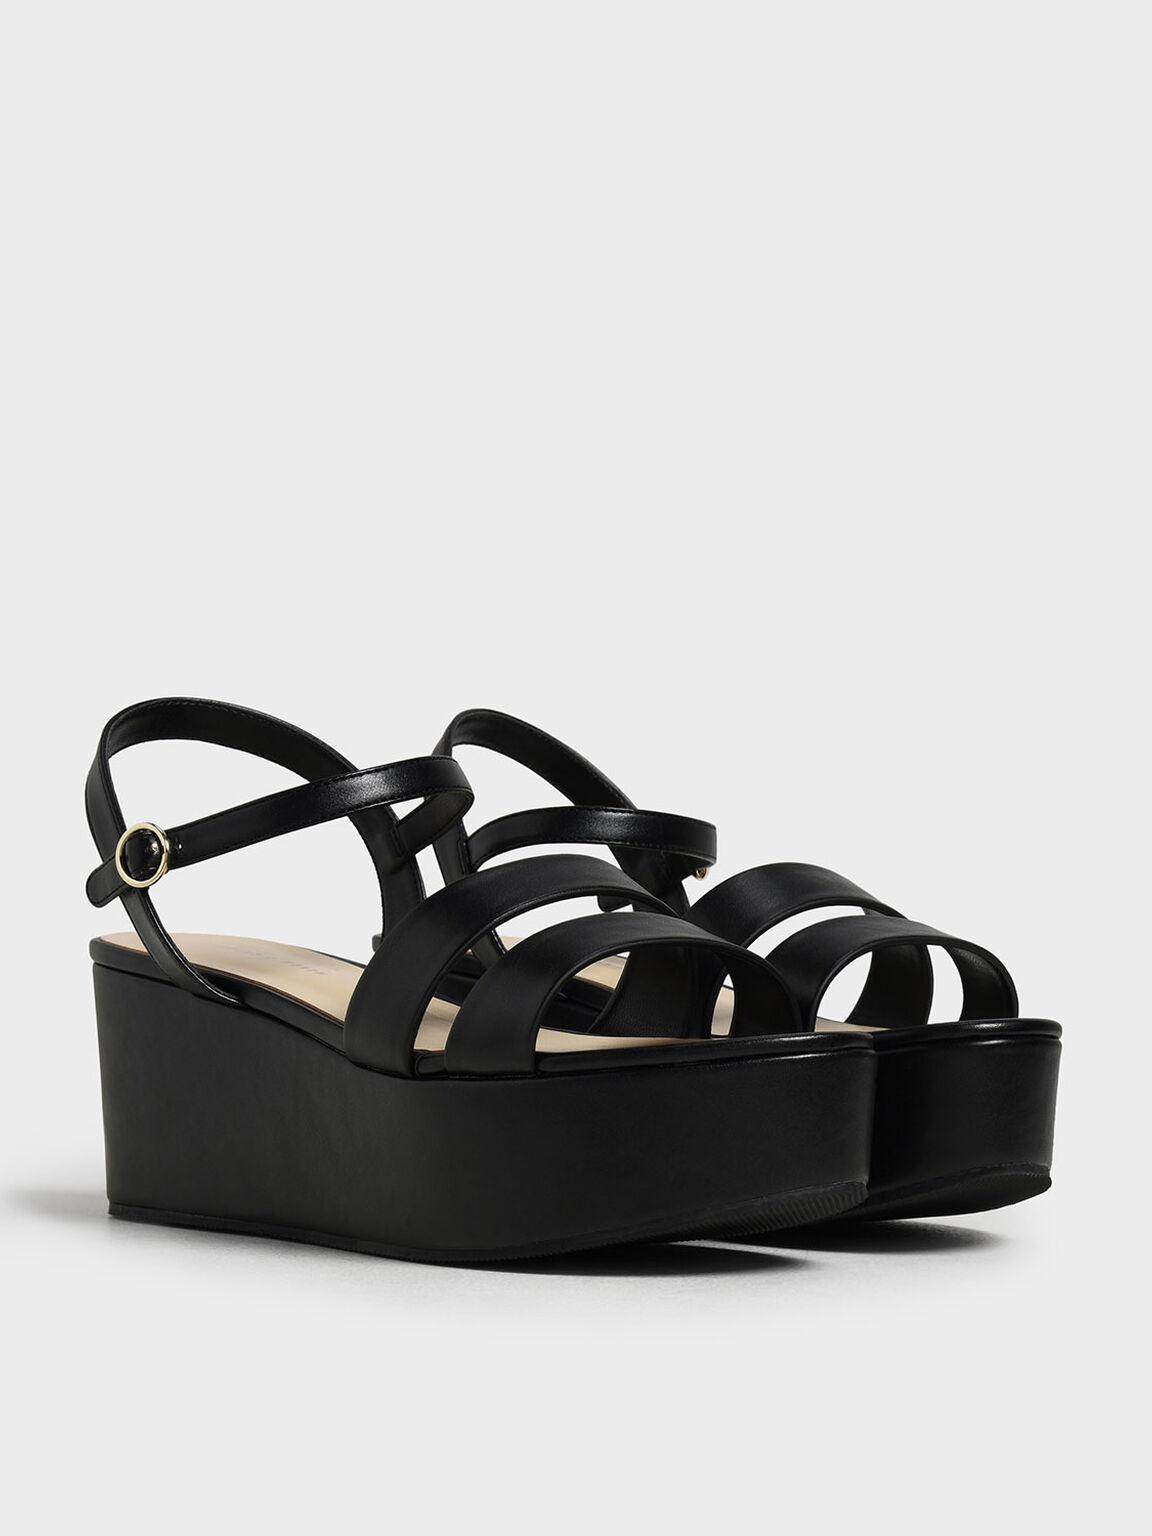 Double Strap Flatform Sandals, Black, hi-res